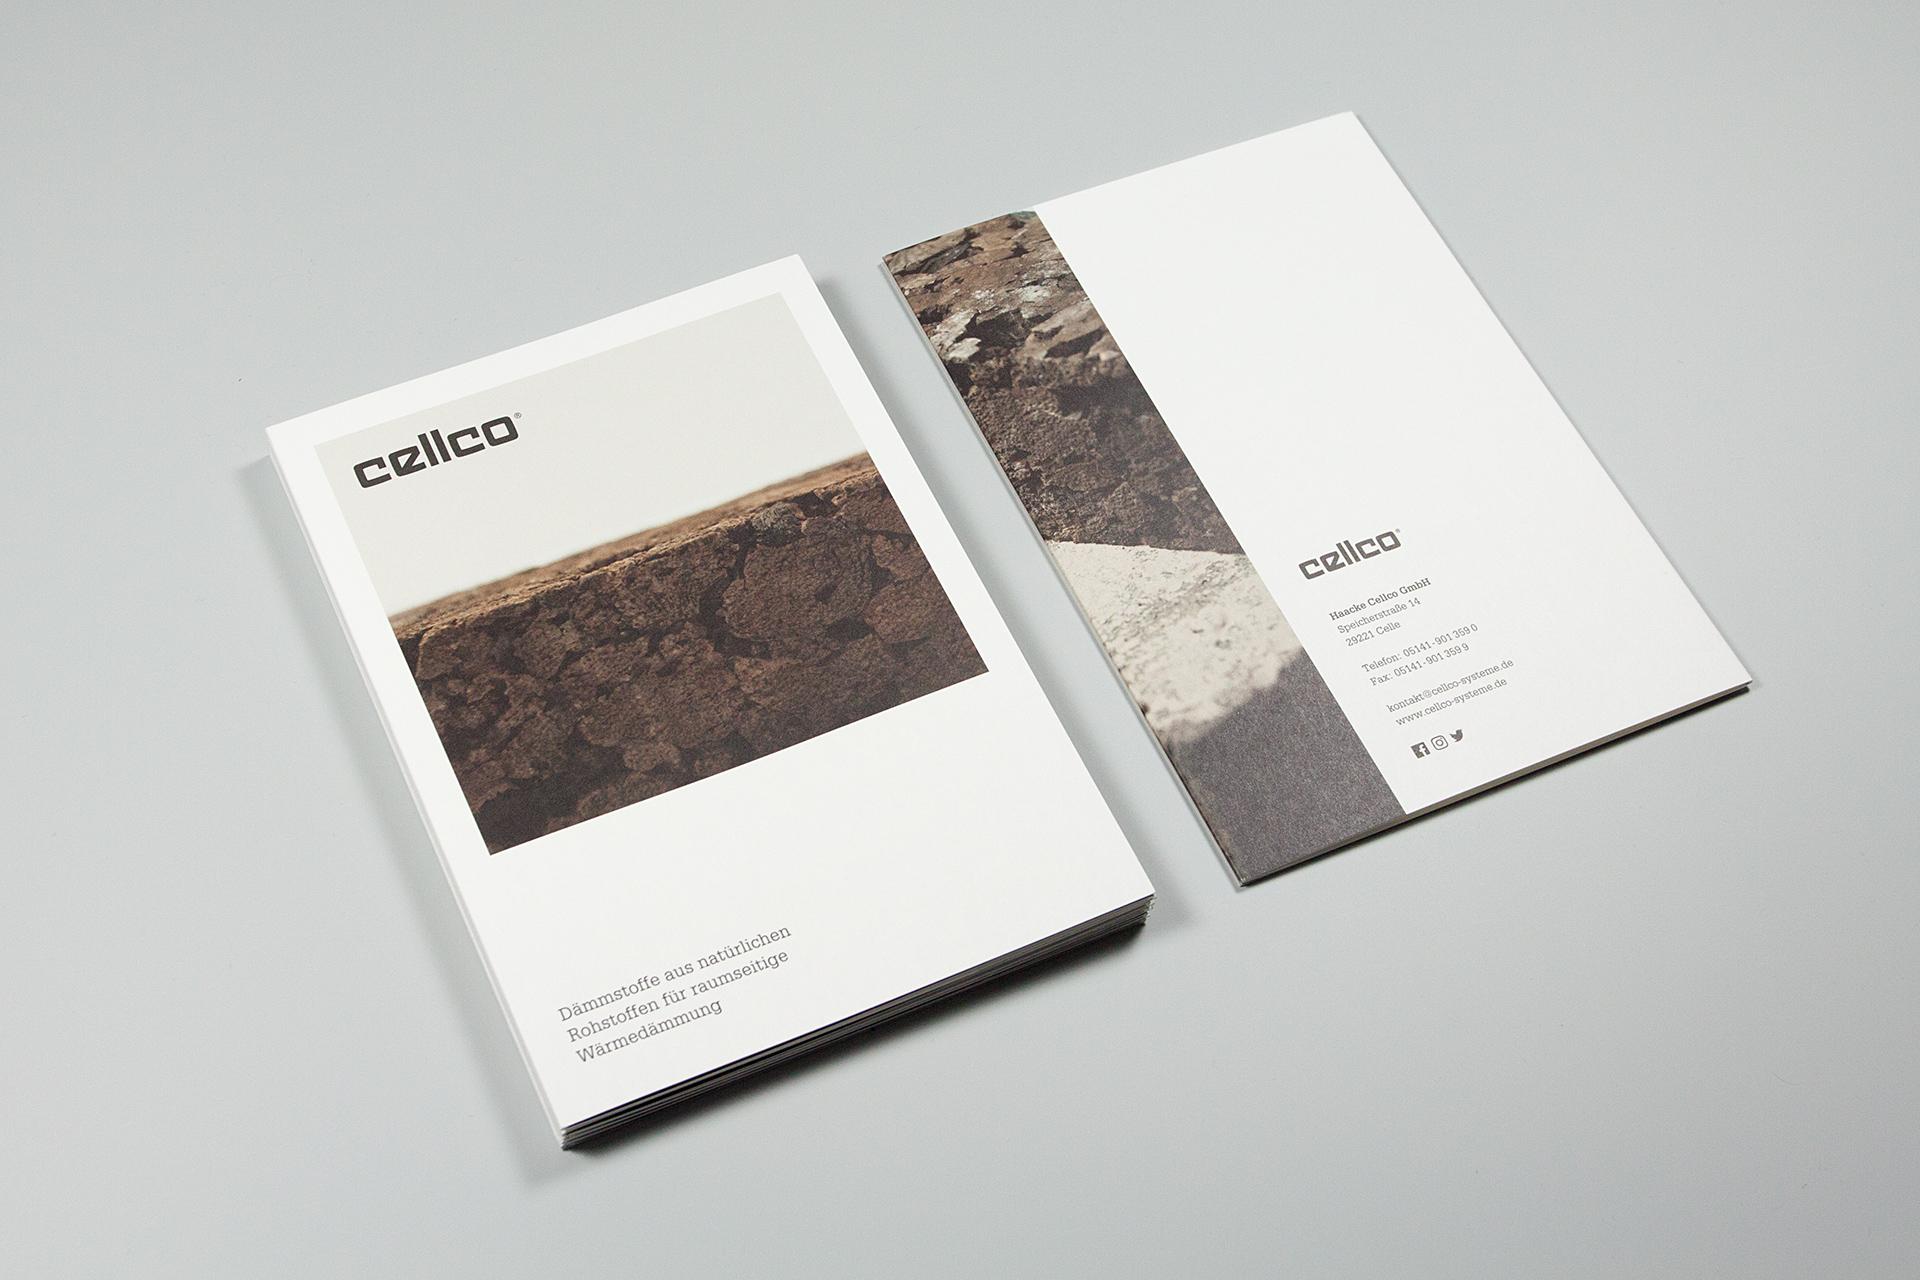 cellco-cd-buero-ink_5653